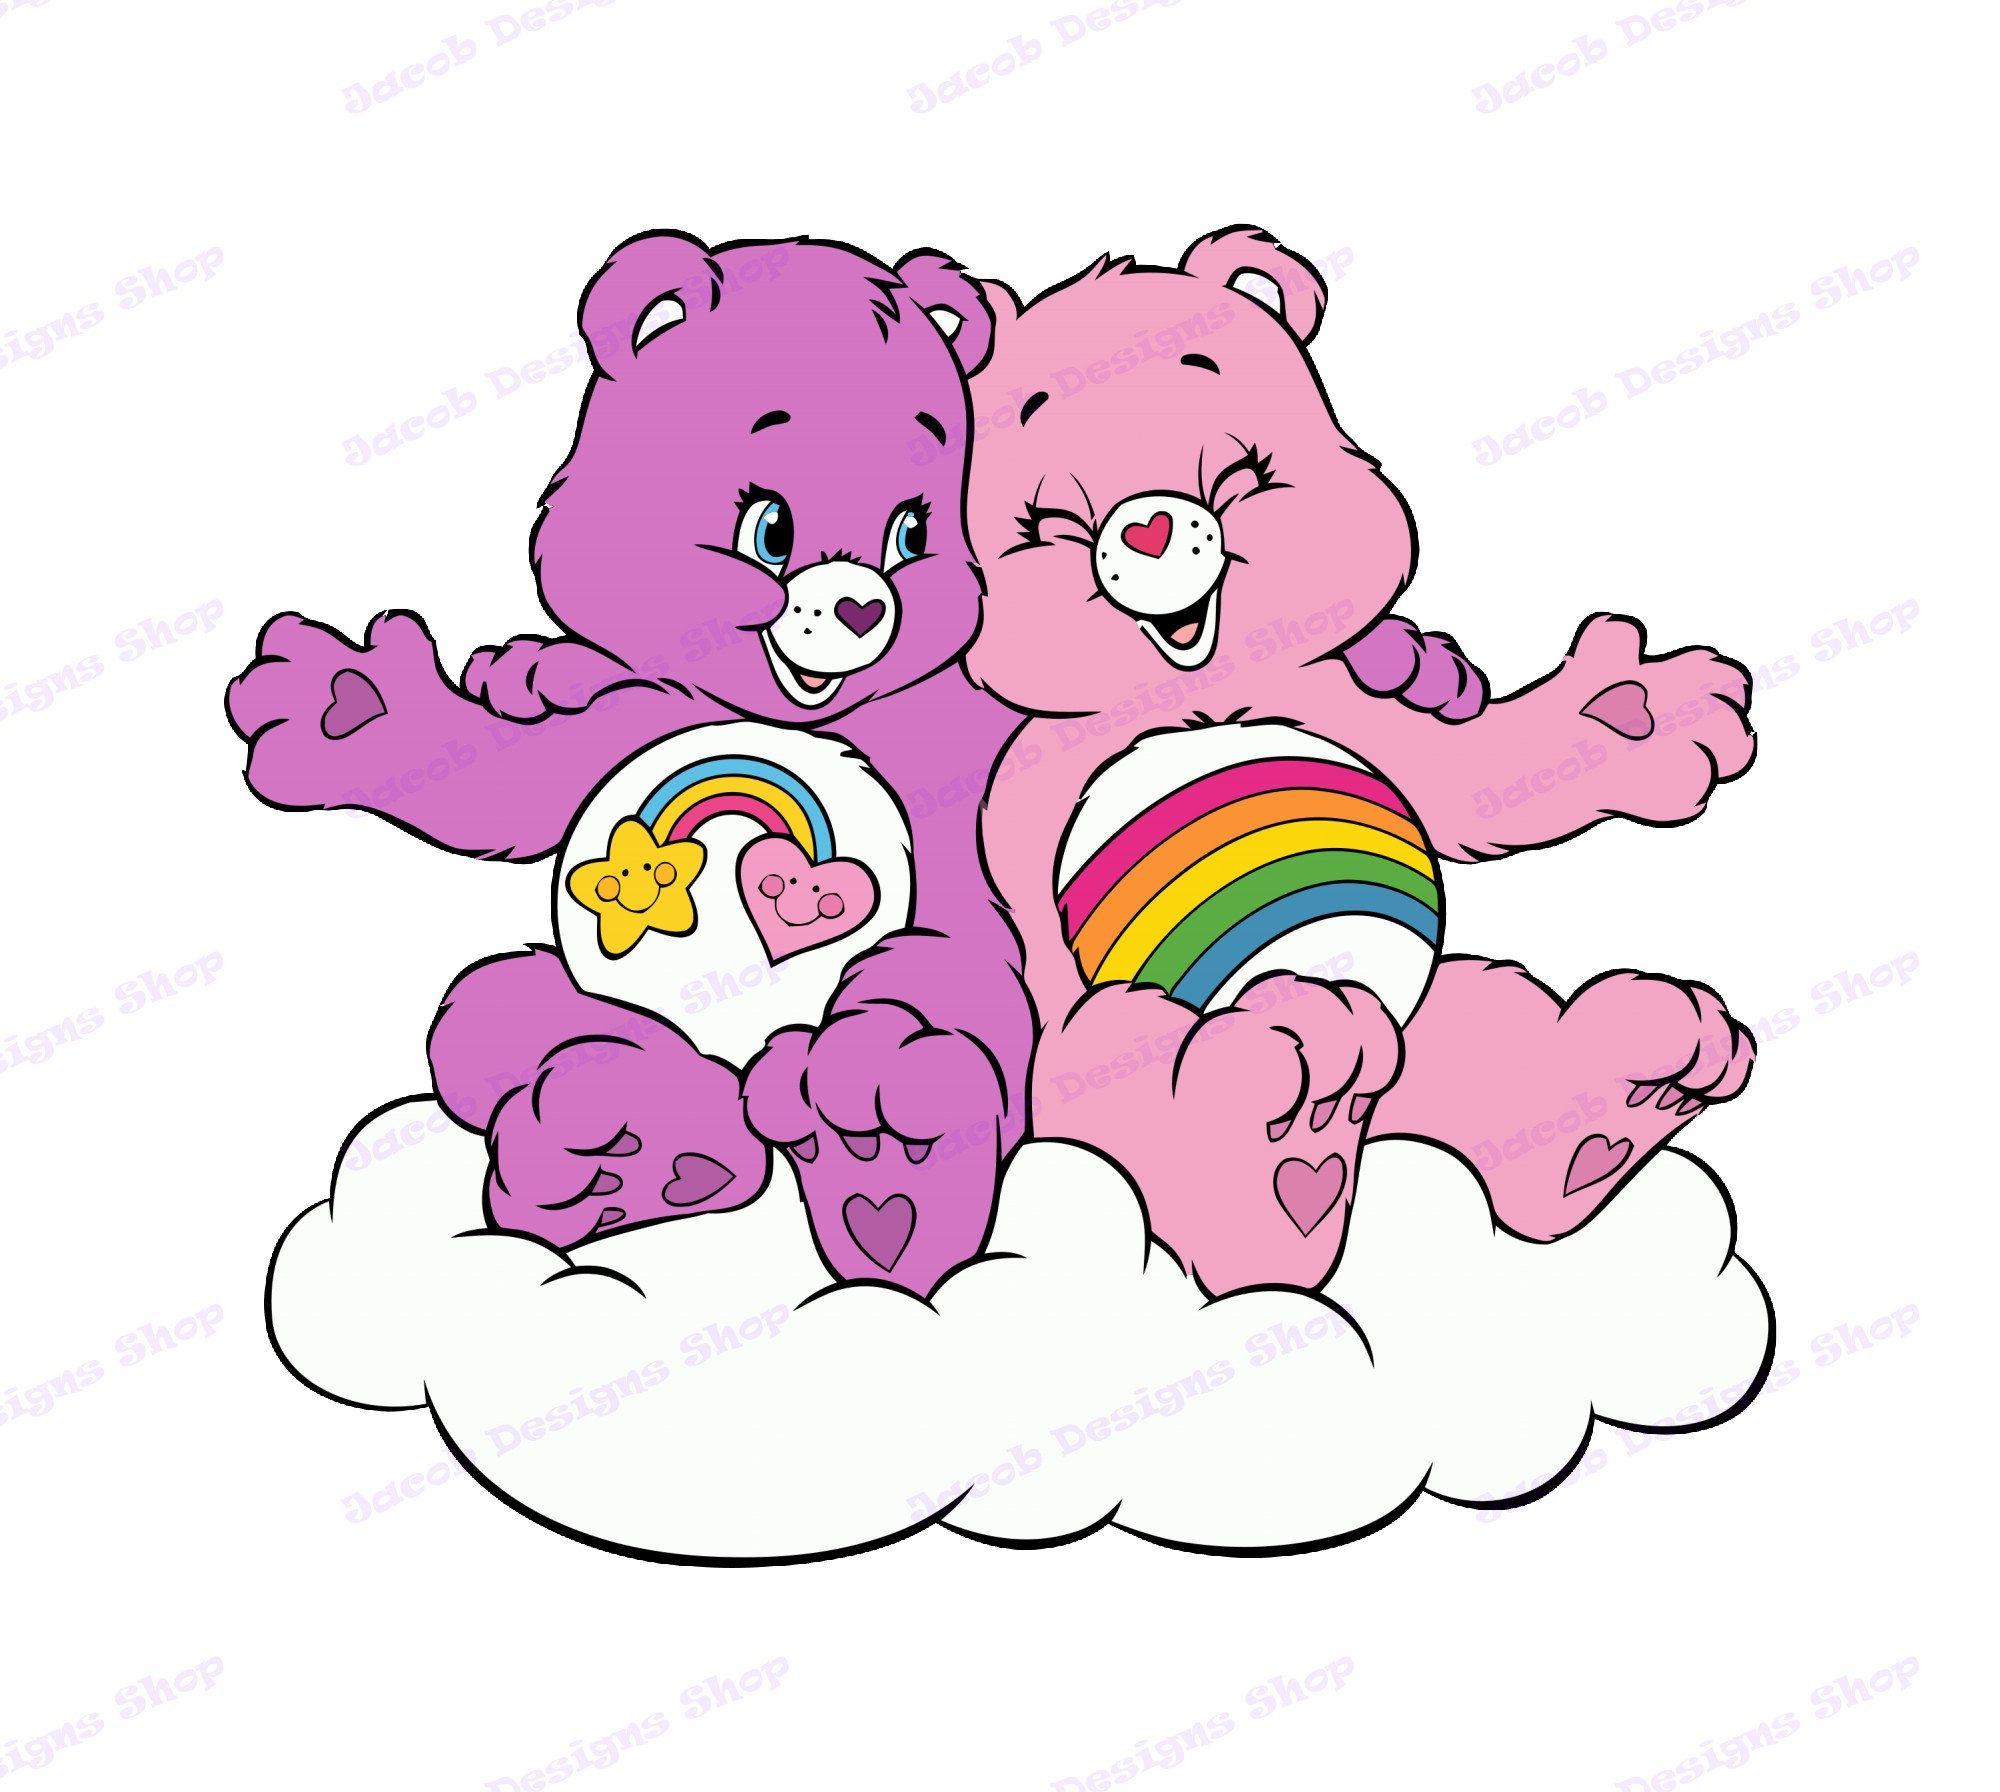 Care Bears SVG 1, svg, dxf, Cricut, Silhouette Cut File, Instant Download